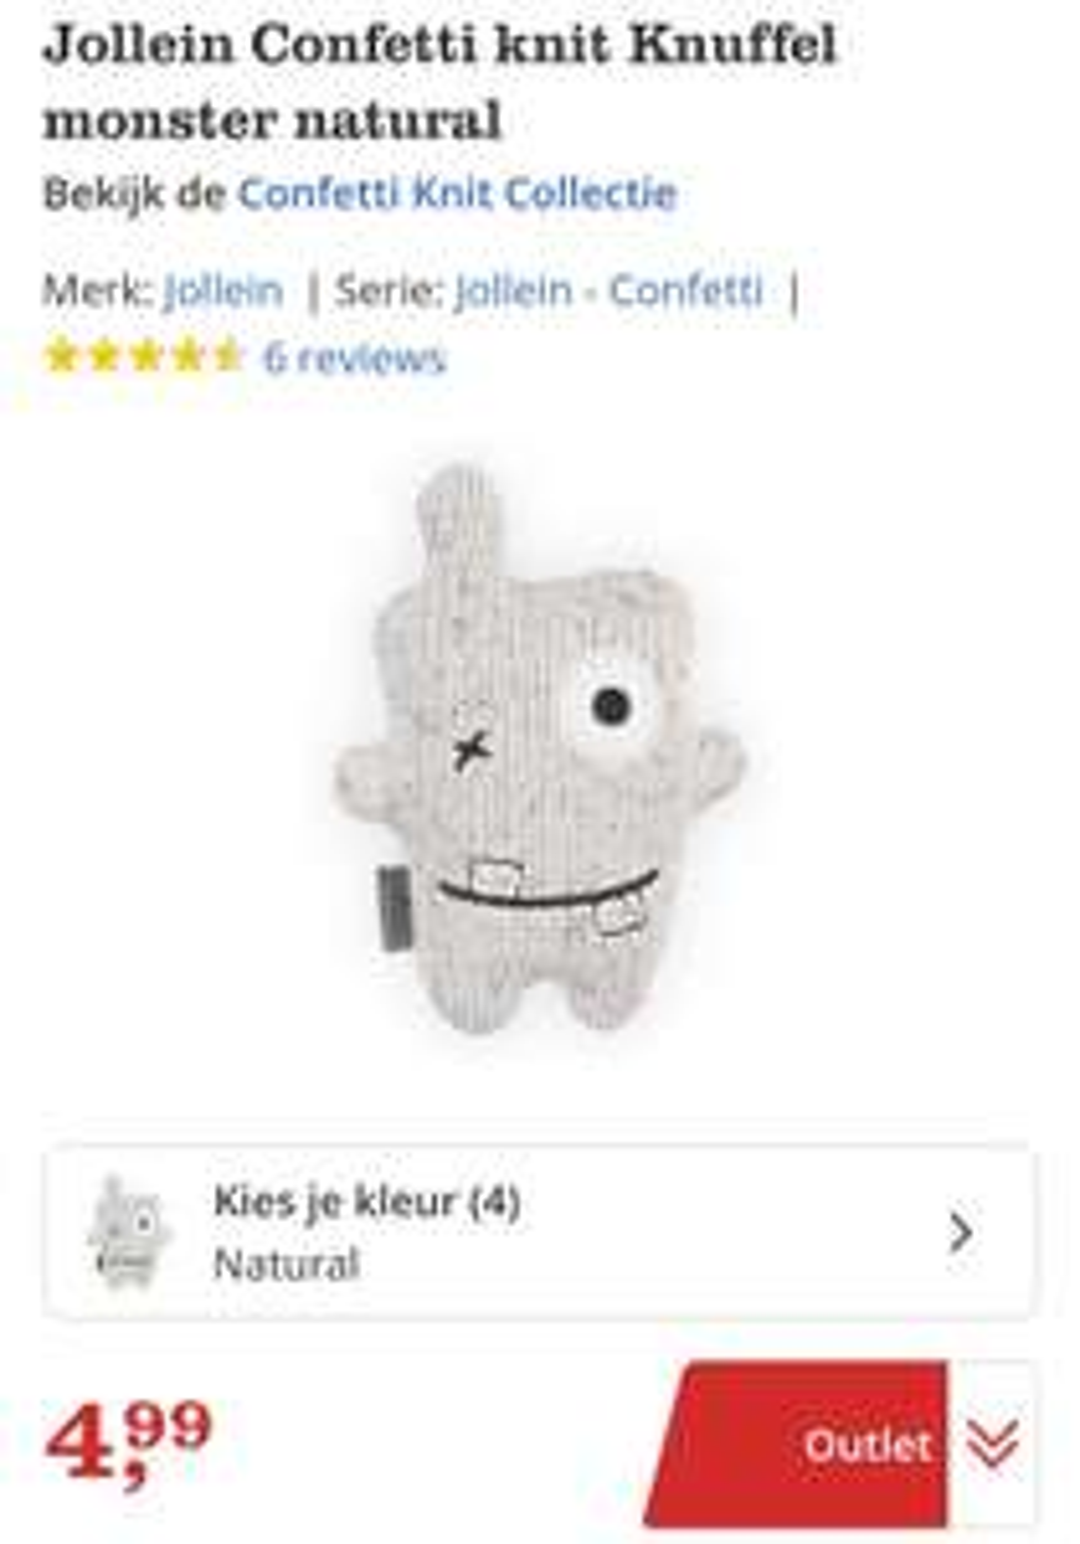 Jollein Confetti knit knuffel van €12,99 voor €3,99